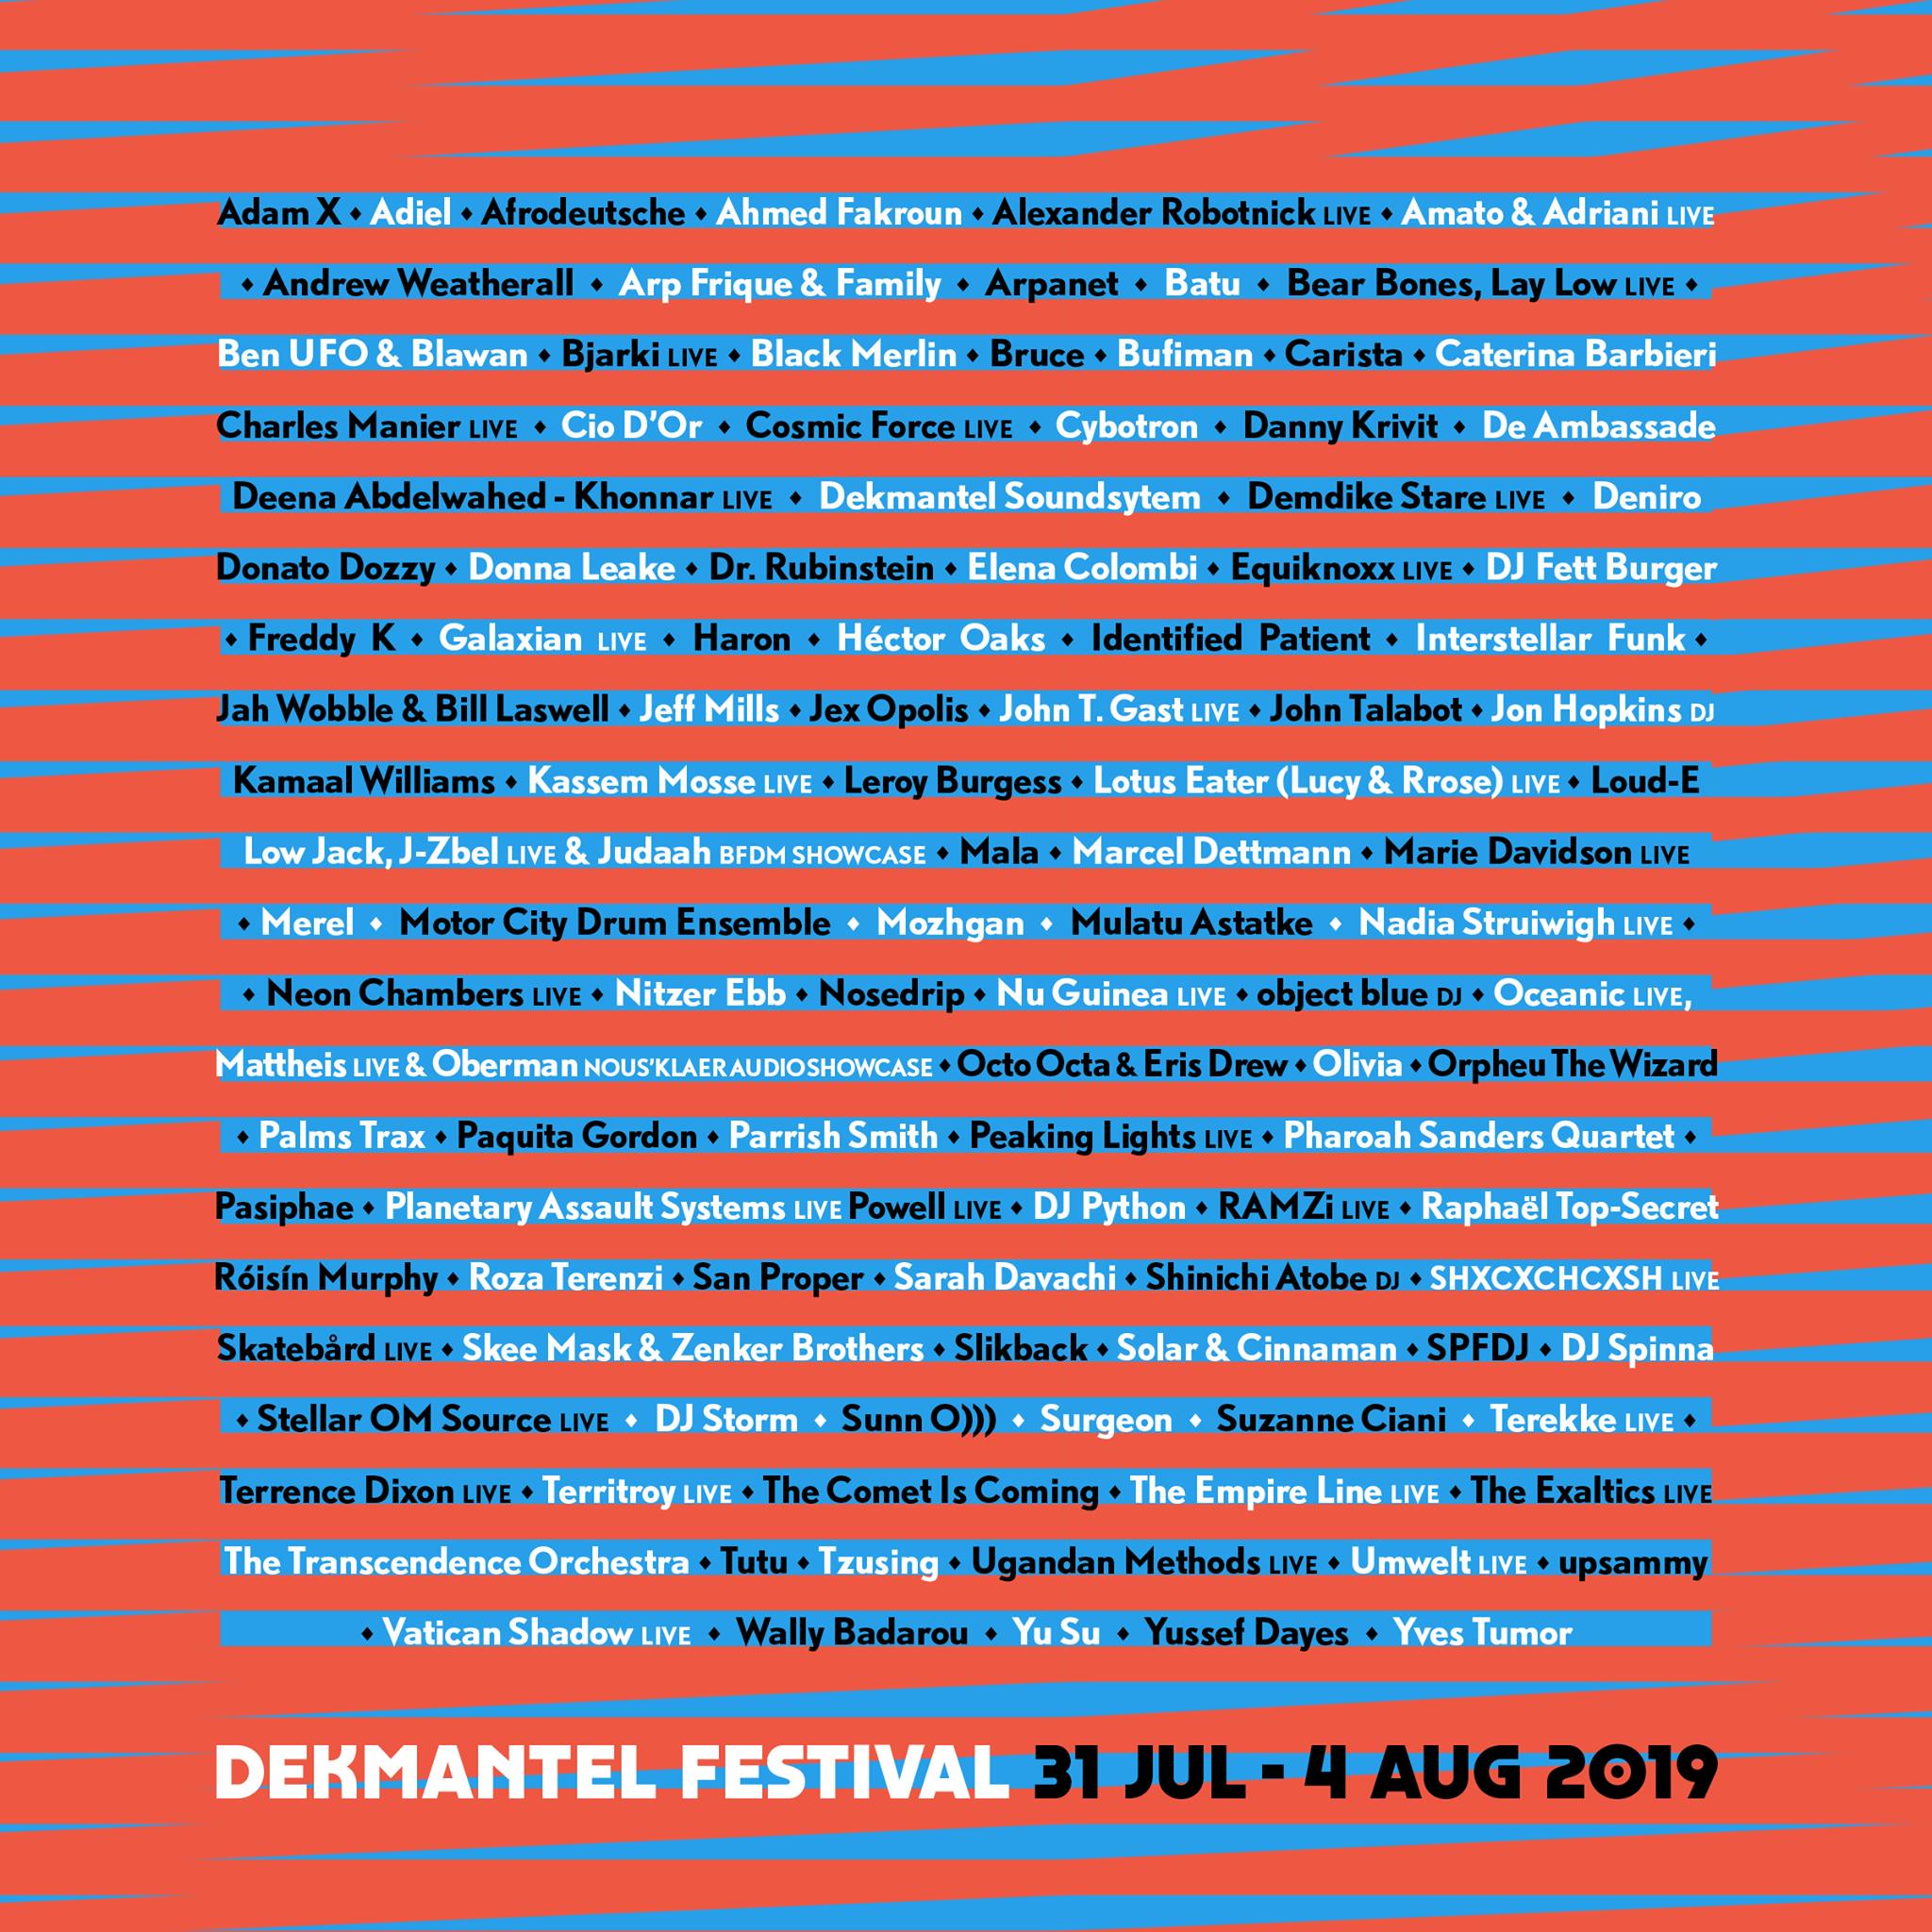 Updated: Dekmantel Reveal 2019 Lineup